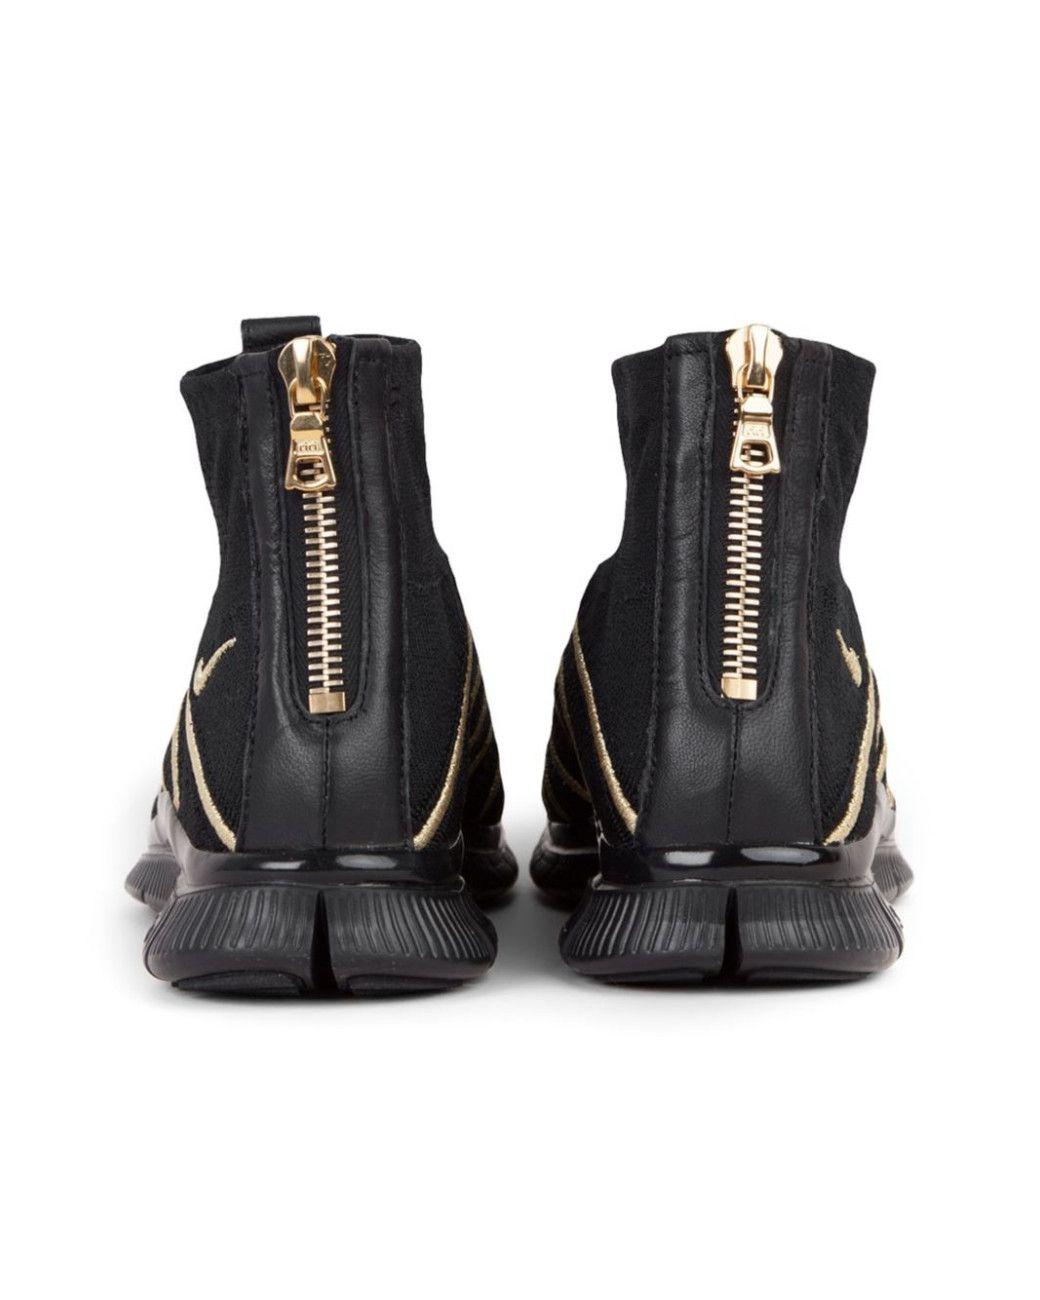 1a79ec8f2 Shoes   Sandals, Boots, Sneakers, Lace-Ups   Men   Lyst   Sports ...